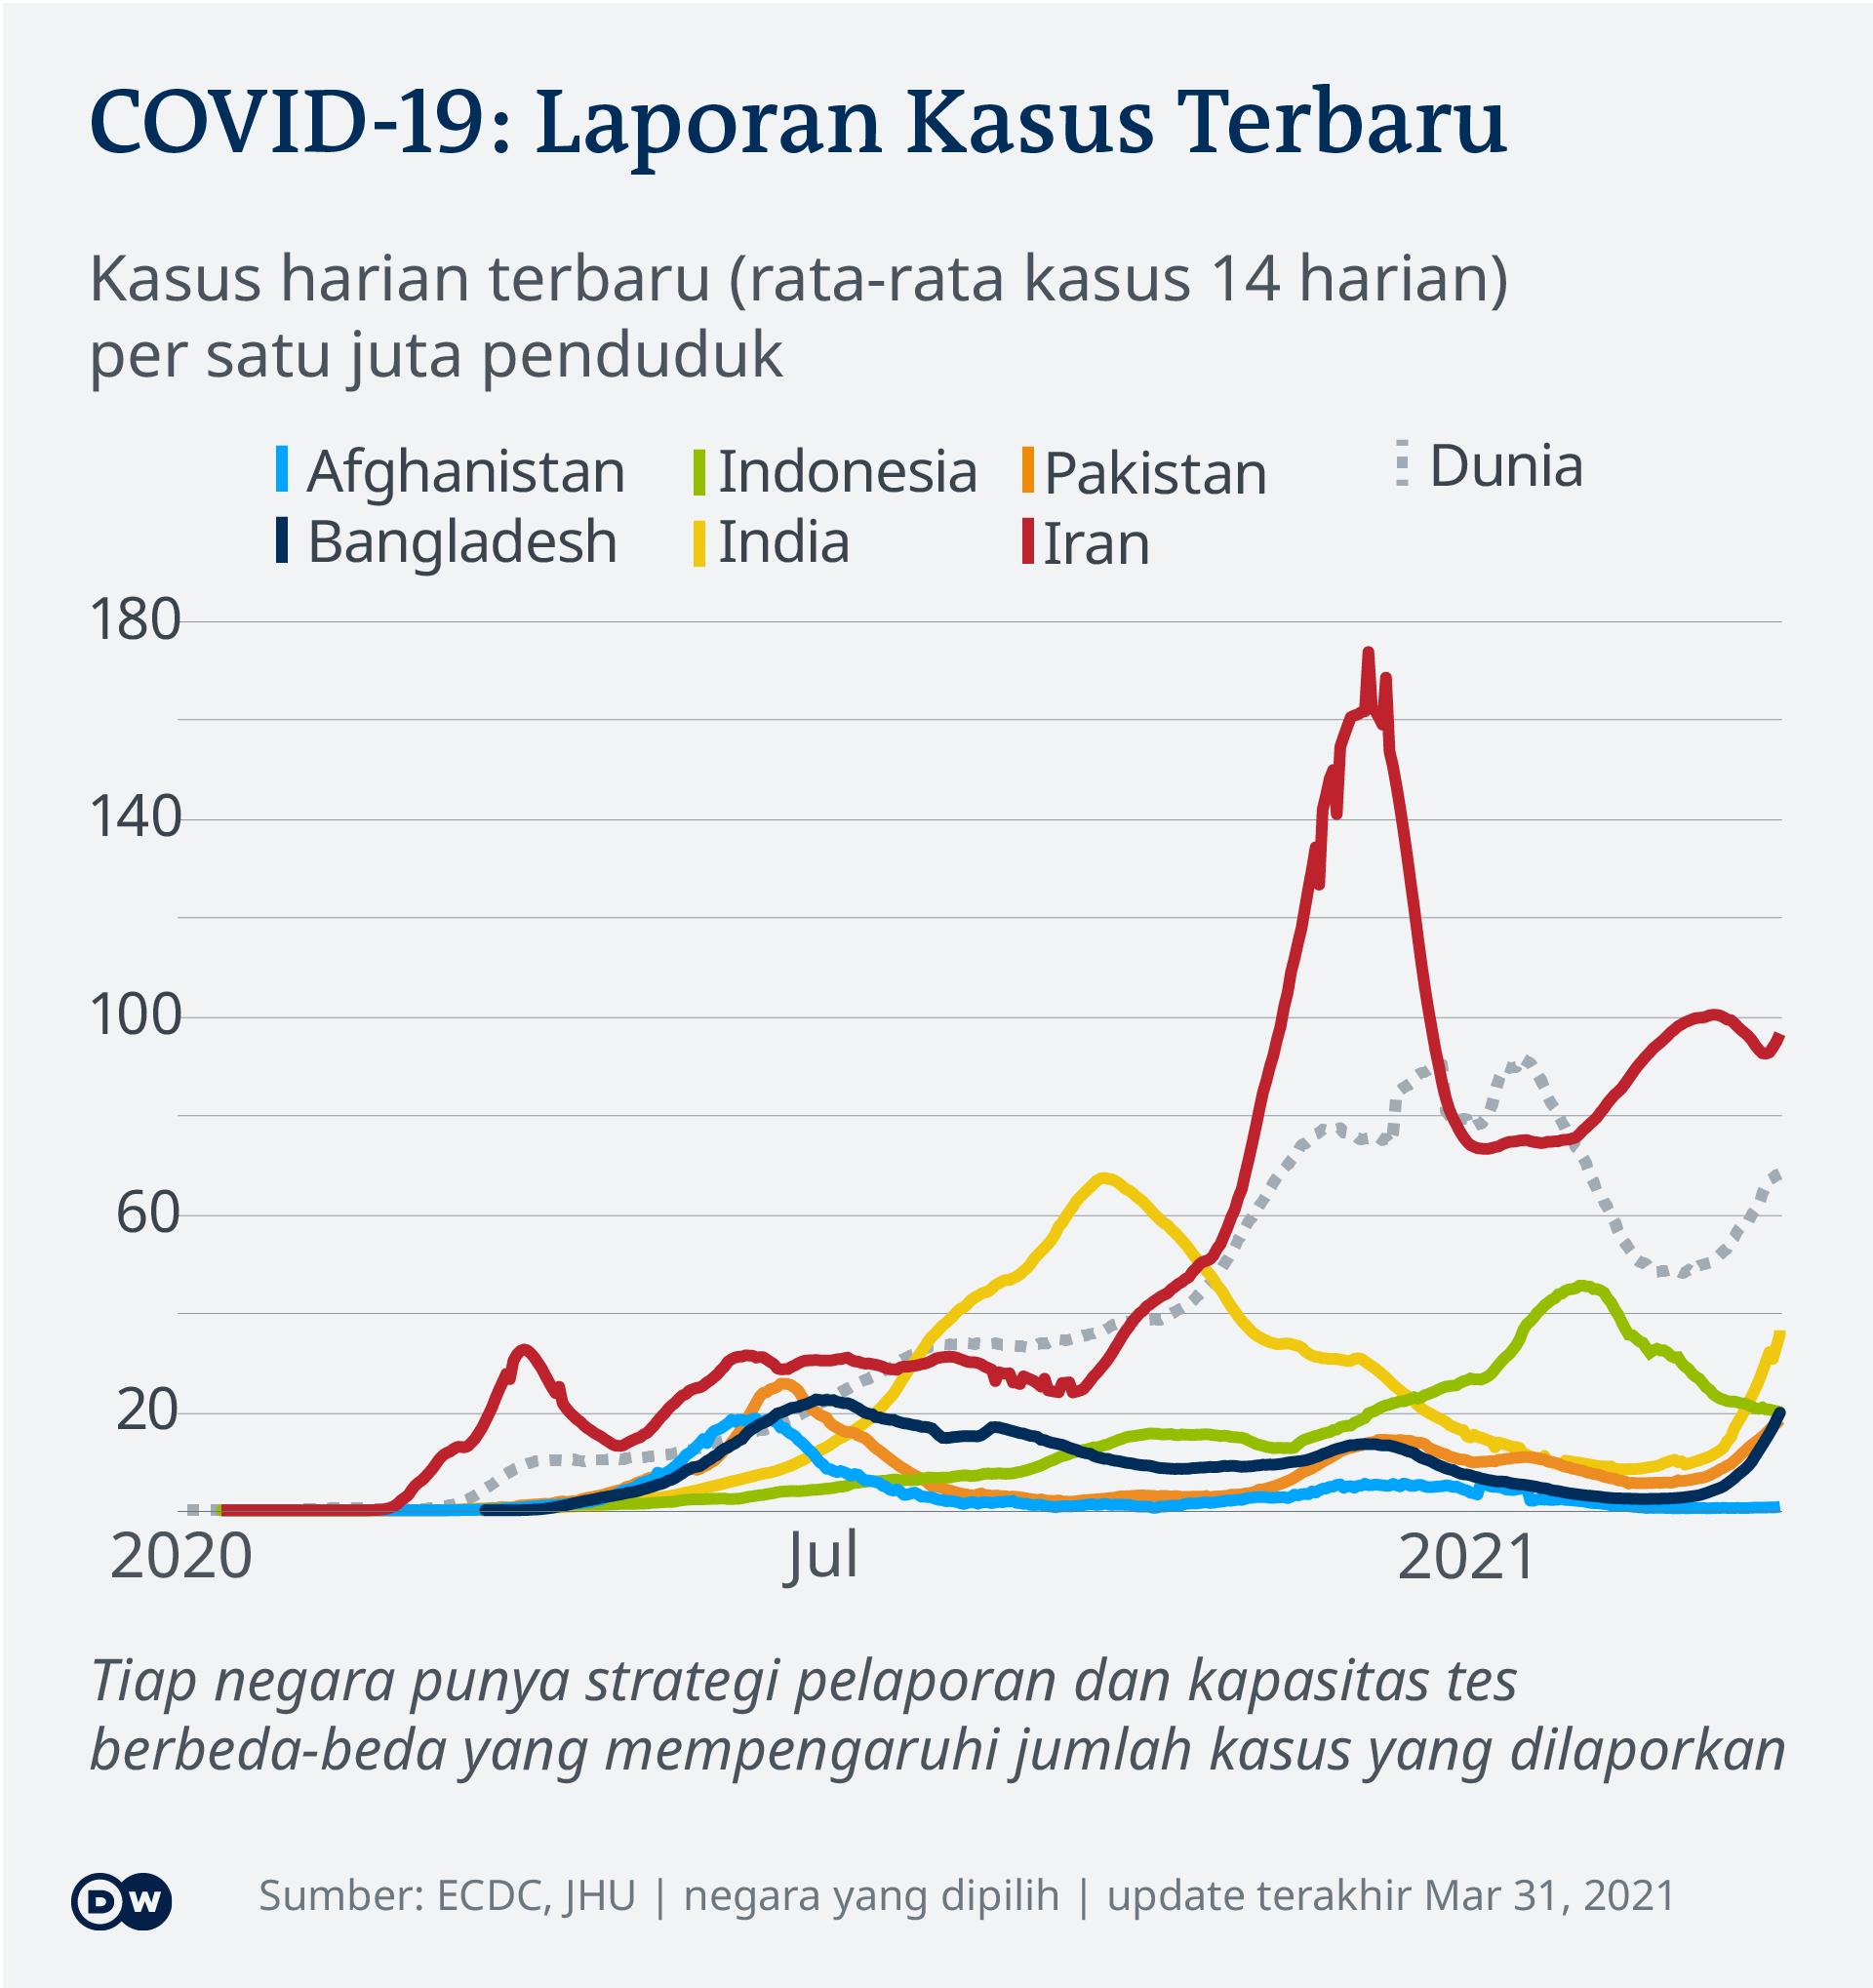 Indonesia Masih Kejar Stok 20 Juta Vaksin Mandiri Indonesia Laporan Topik Topik Yang Menjadi Berita Utama Dw 23 02 2021